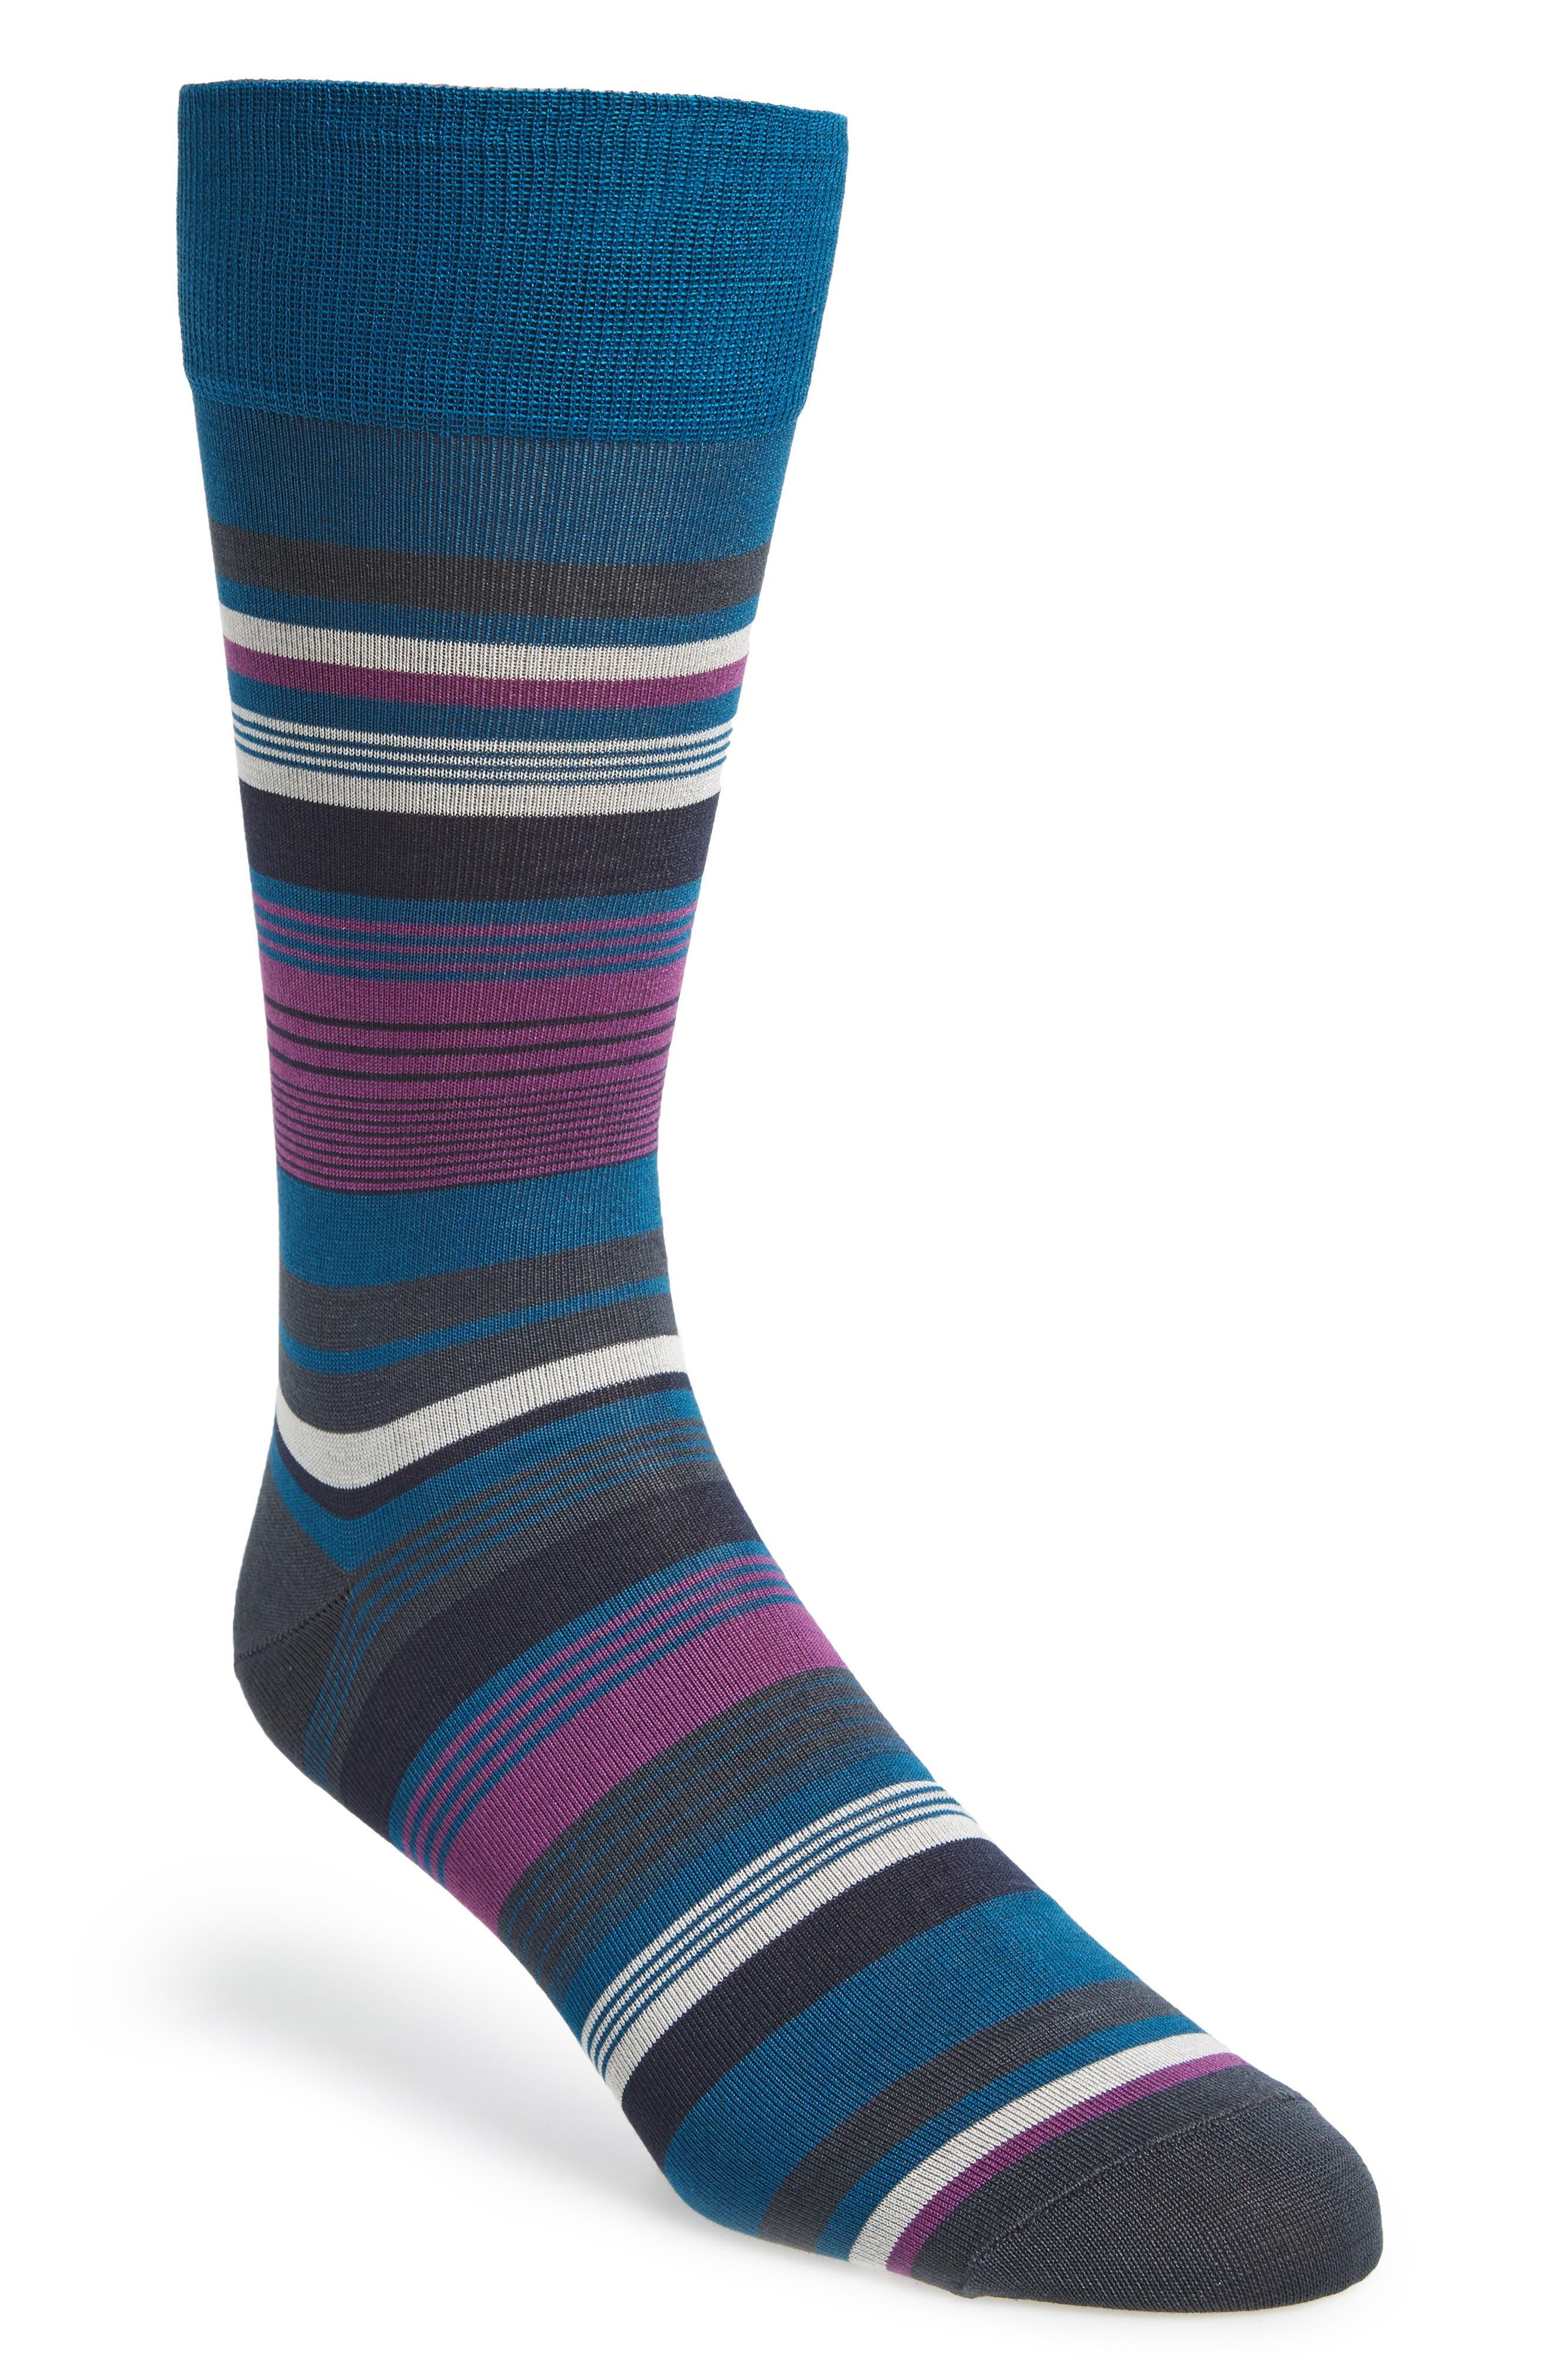 Stripe Socks,                             Main thumbnail 1, color,                             Teal Mosaic